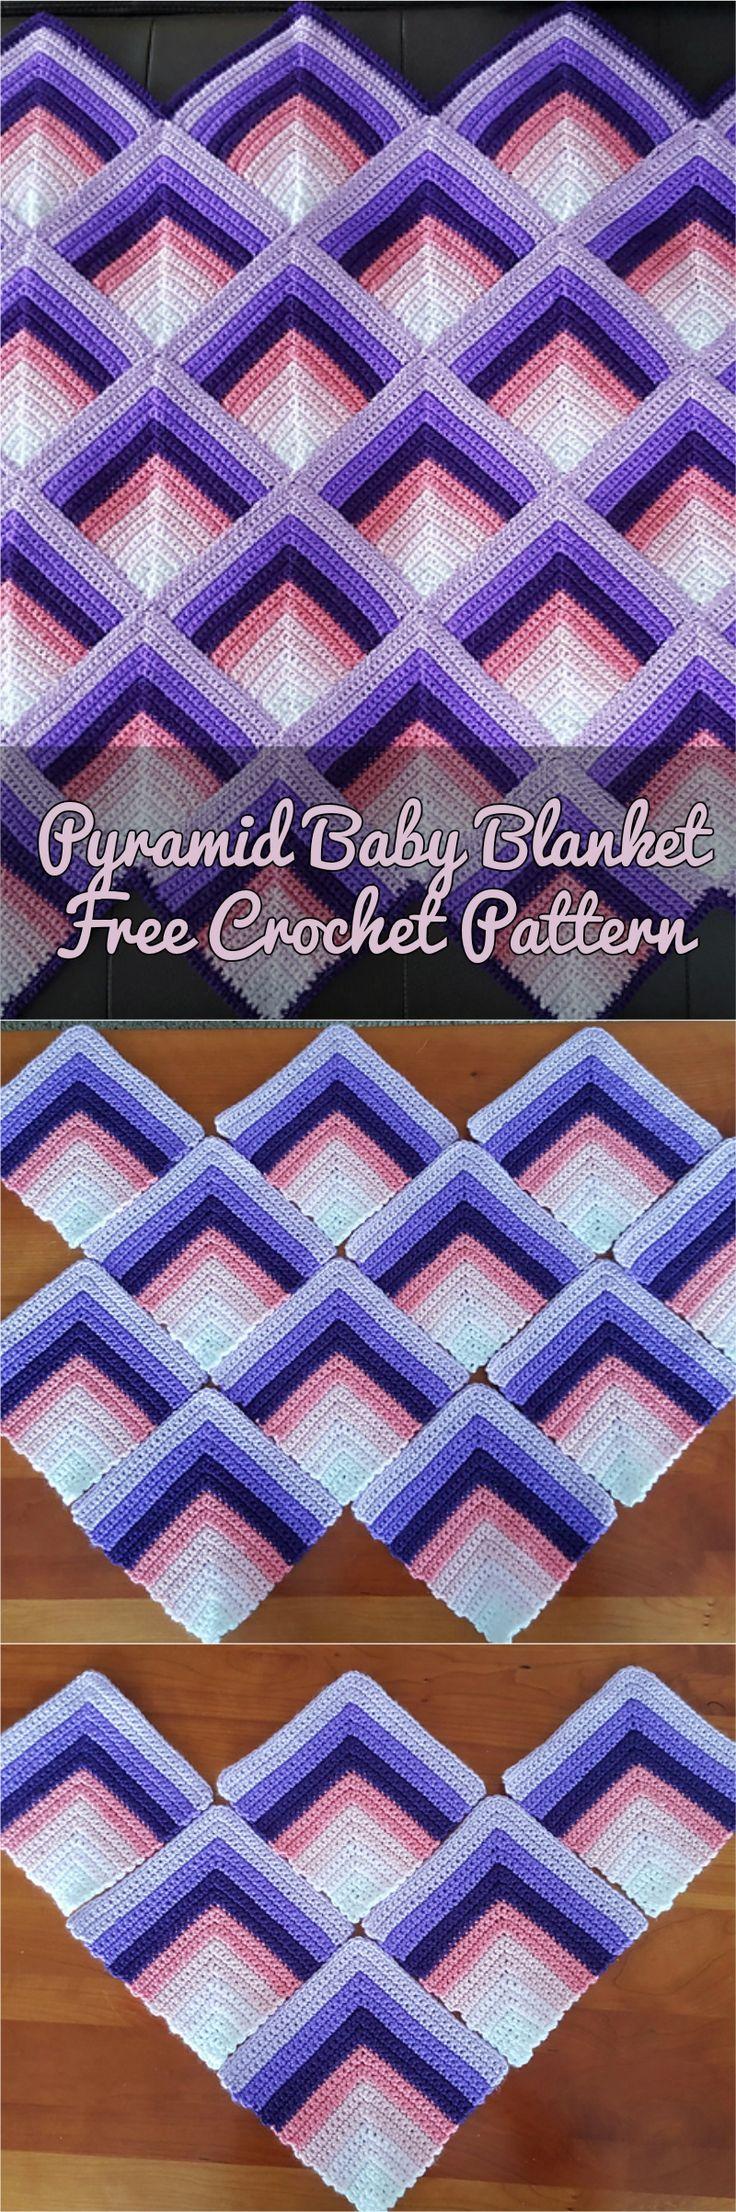 Pyramid Baby Blanket [Free Crochet Pattern] | Patterns Valley